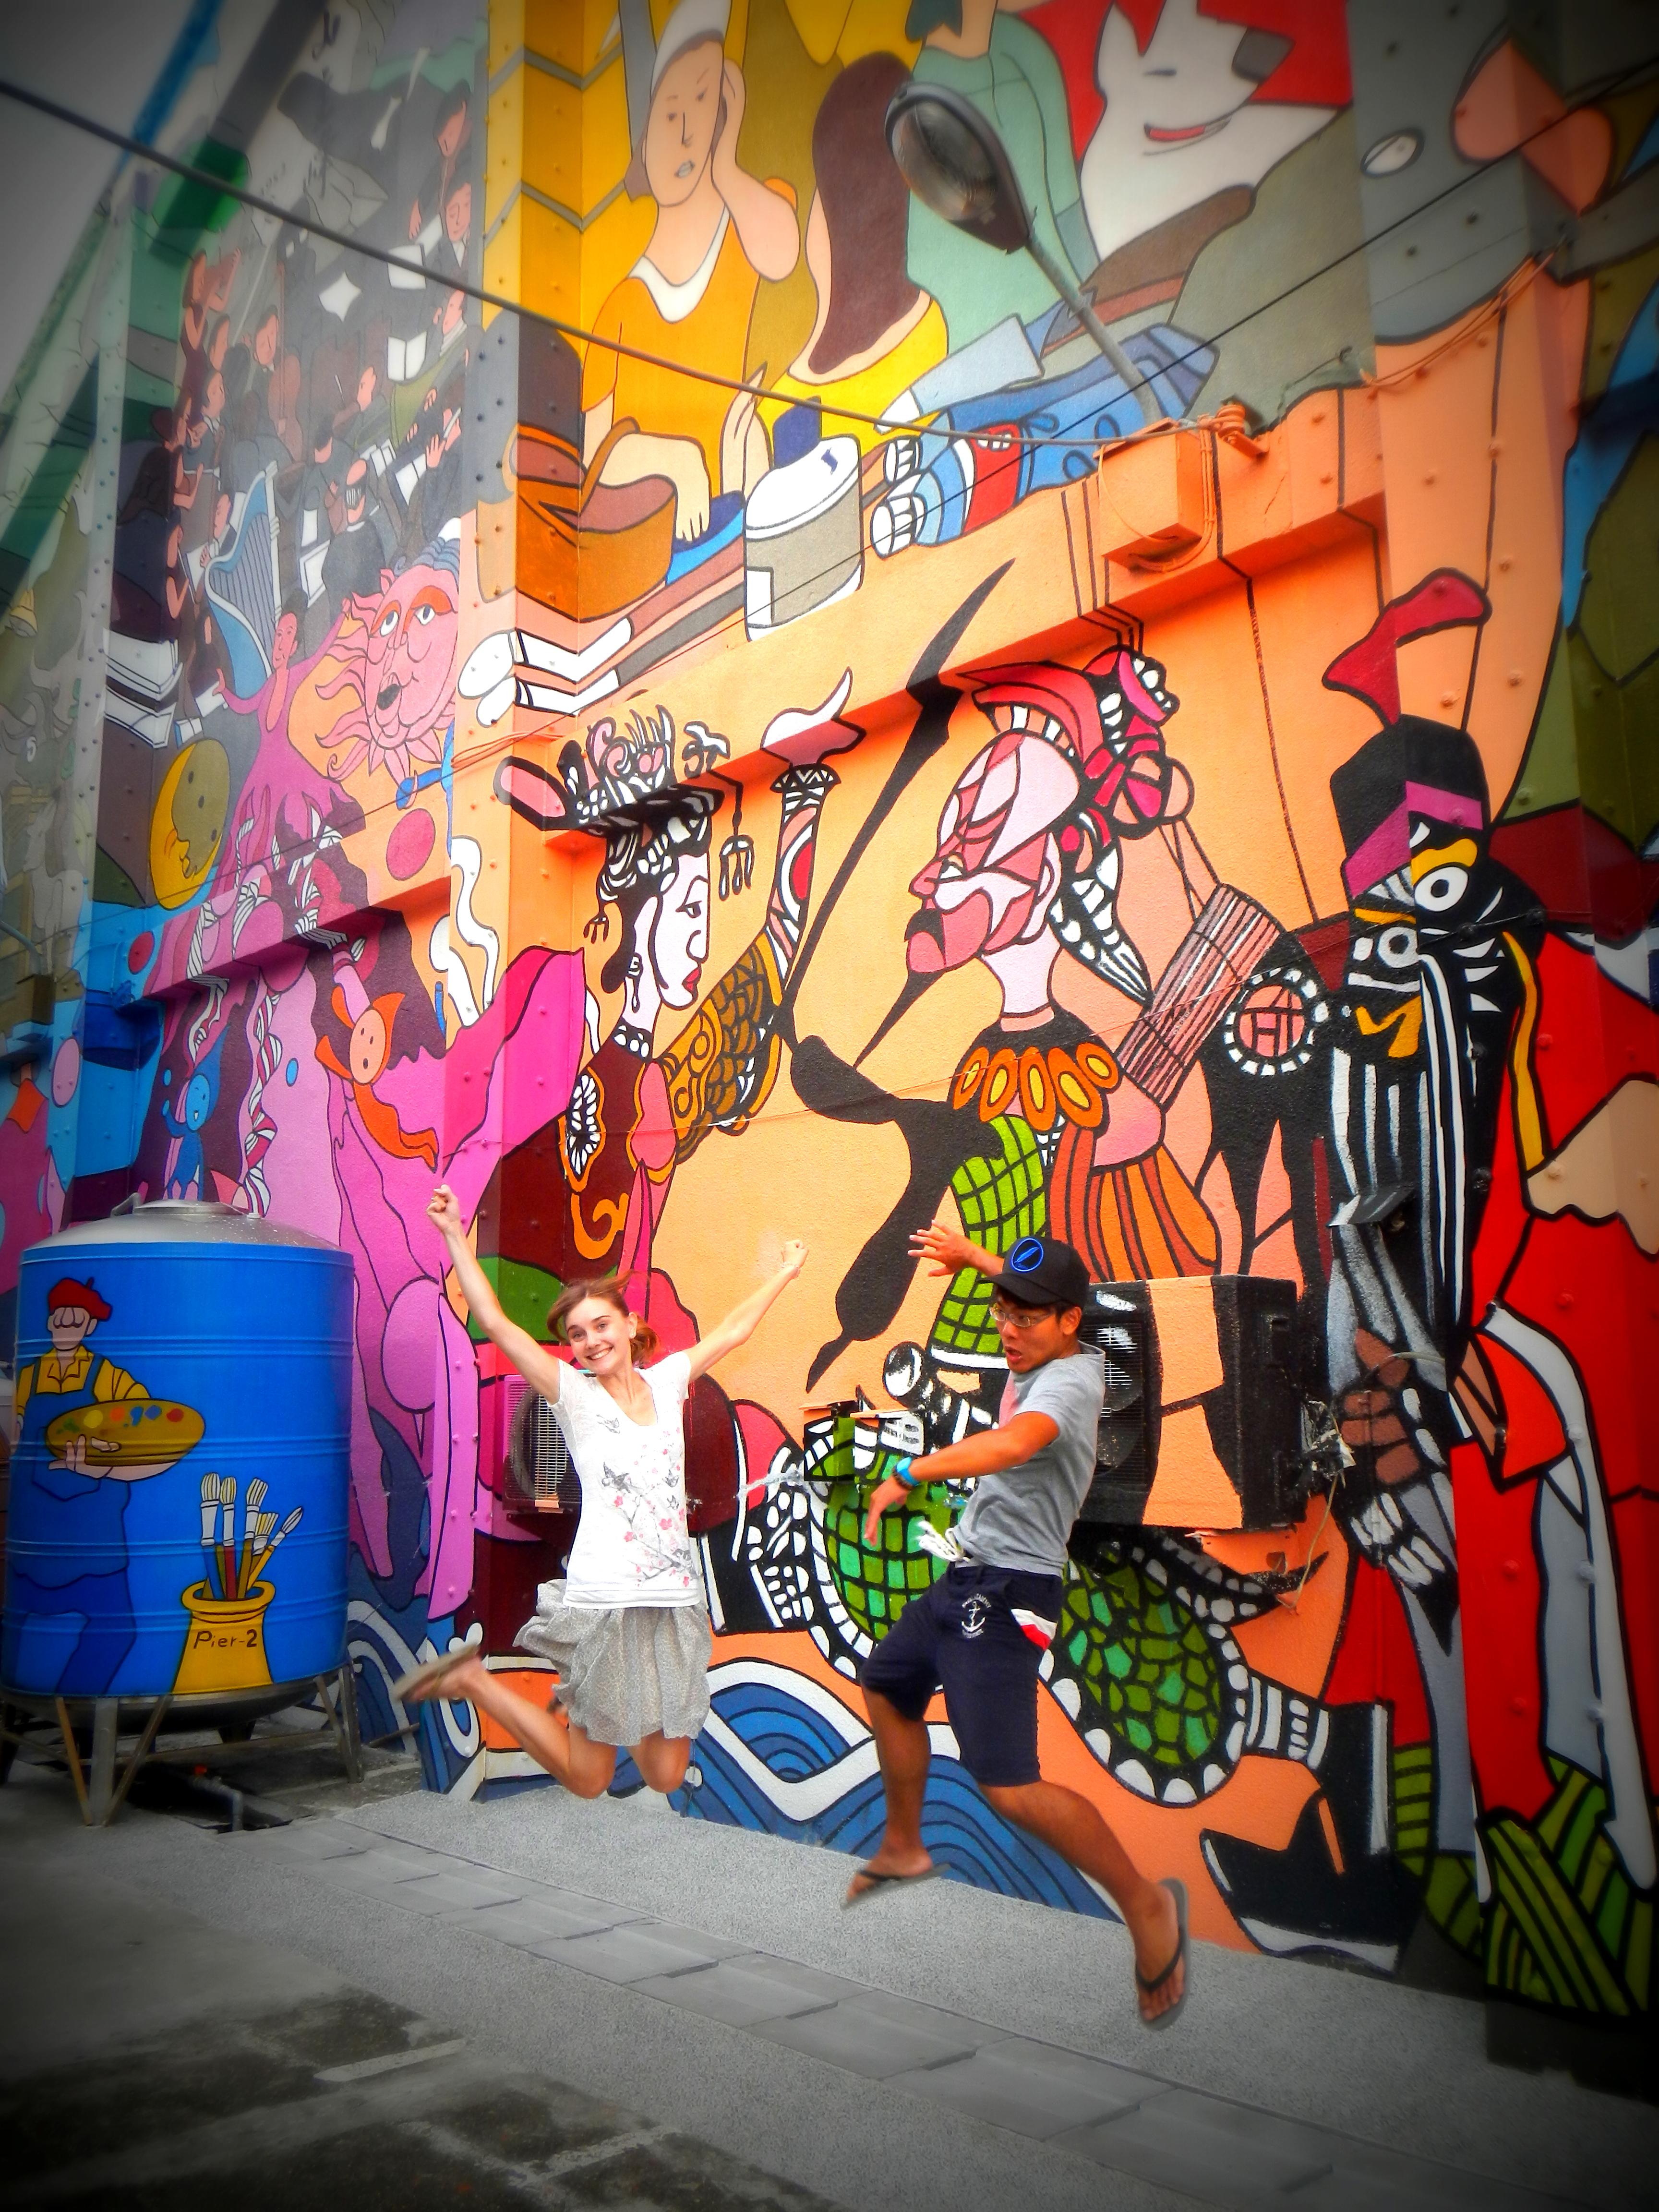 Street art in Kaohsiung, Taiwan